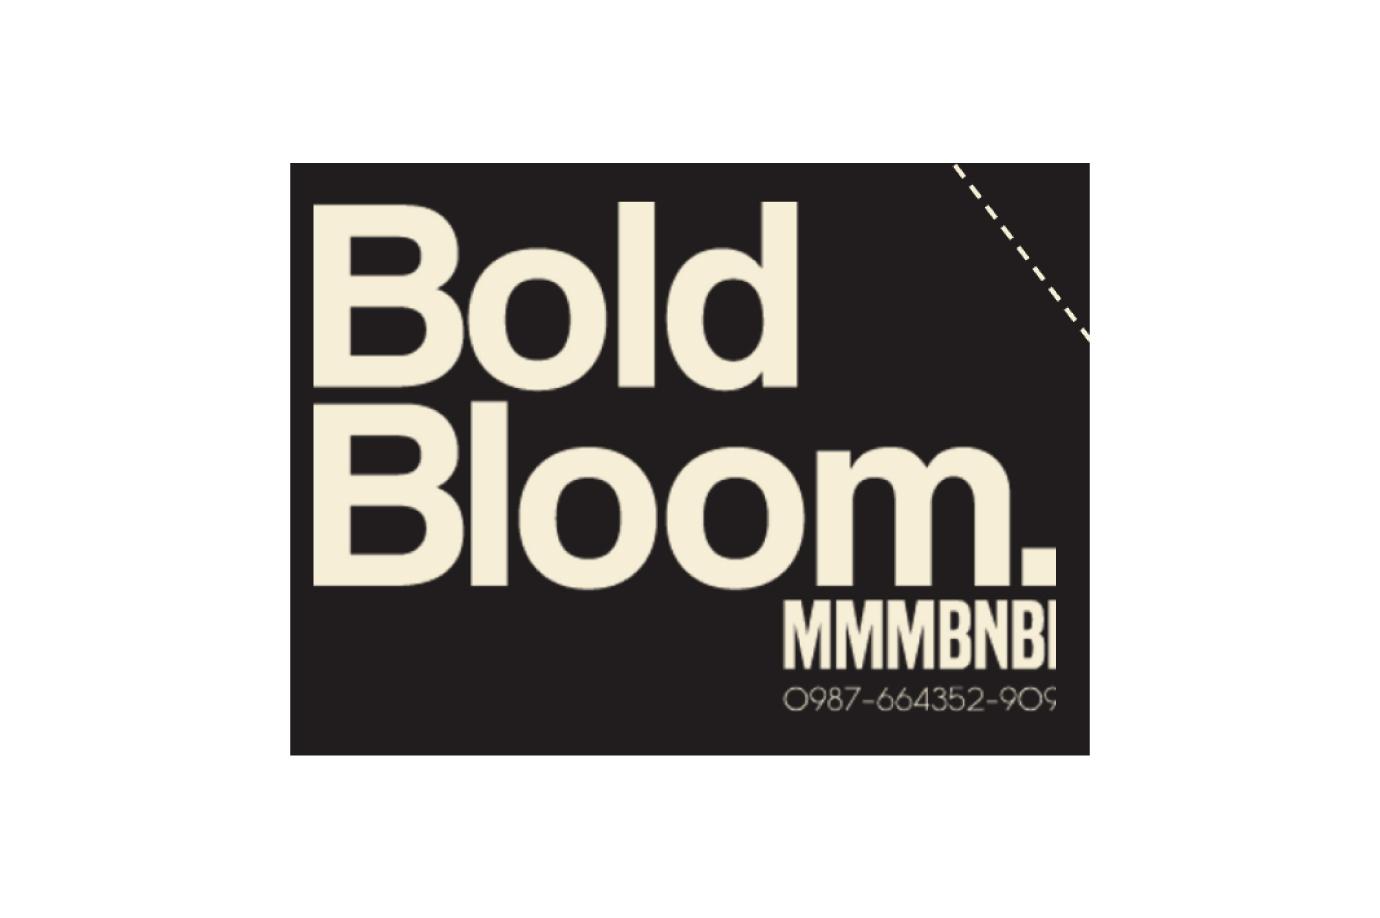 boldbloom-60